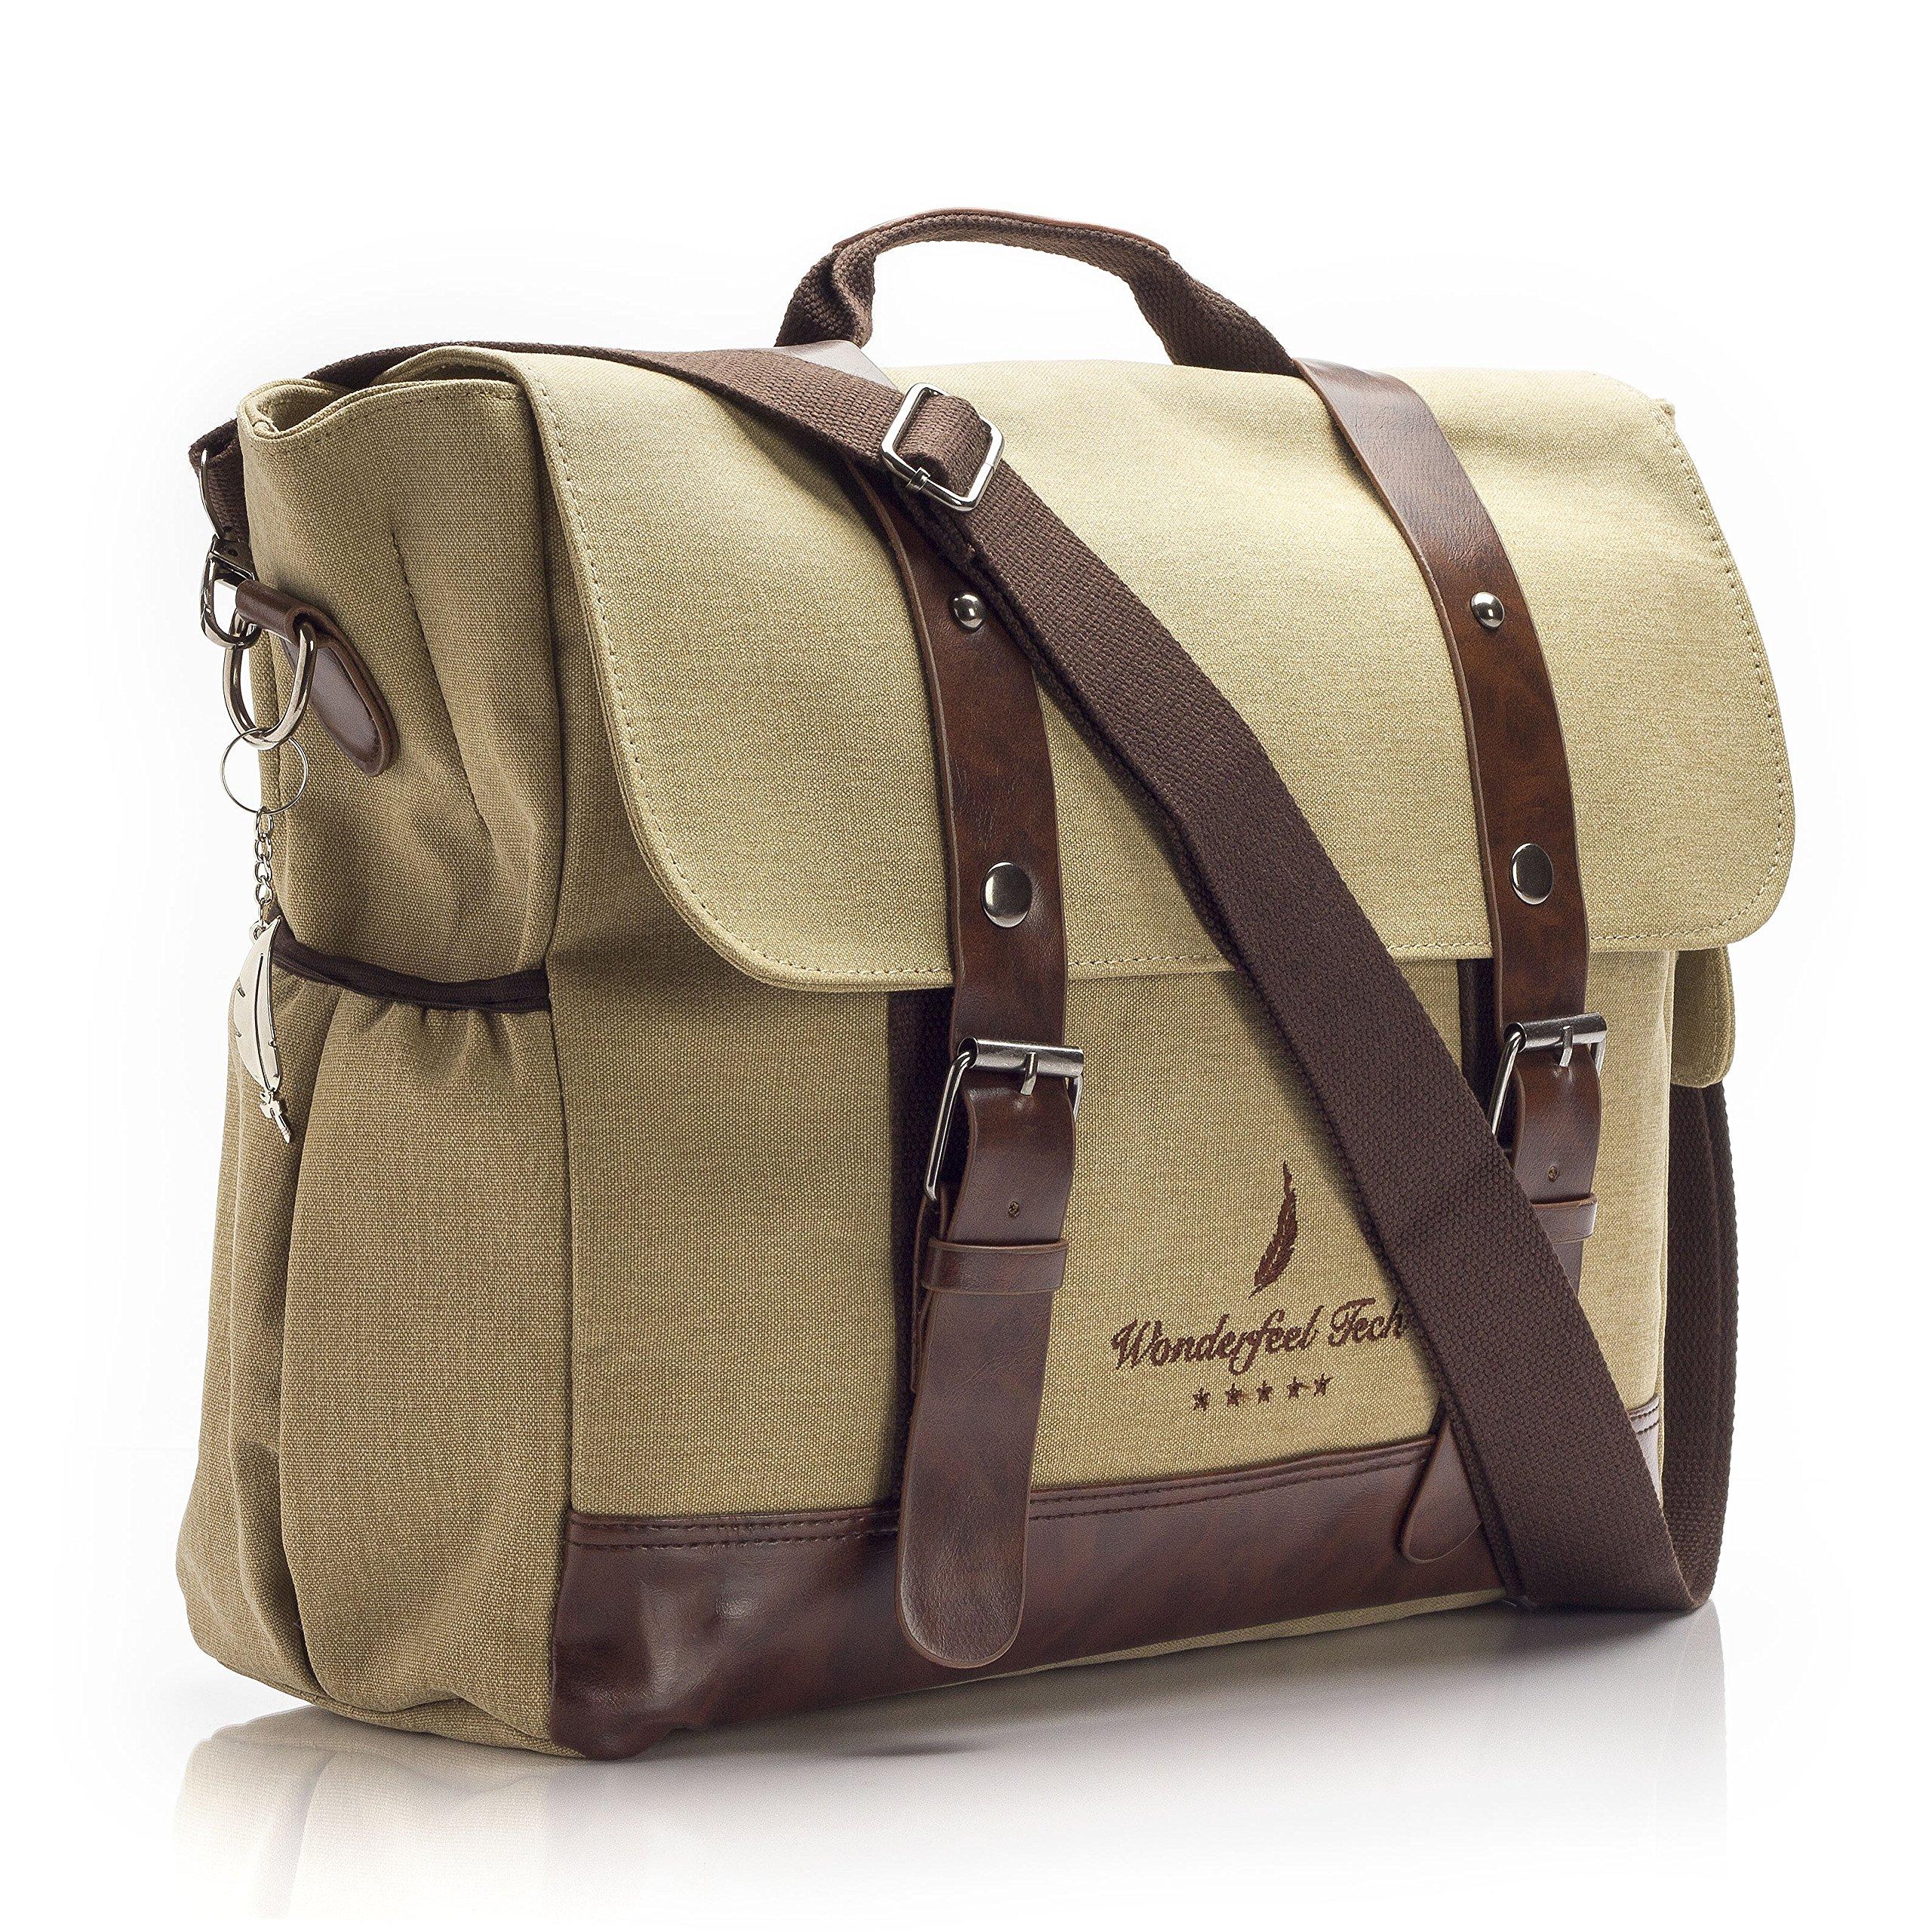 "Vintage Style Laptop Messenger Bag | Multipurpose Ergonomic Lightweight Design | Safe Shockproof Sleeve | Genuine Leather & Canvas Satchel Fits Devices up to 15.6"" +FREE BONUS Feather Keychain GIFT!"